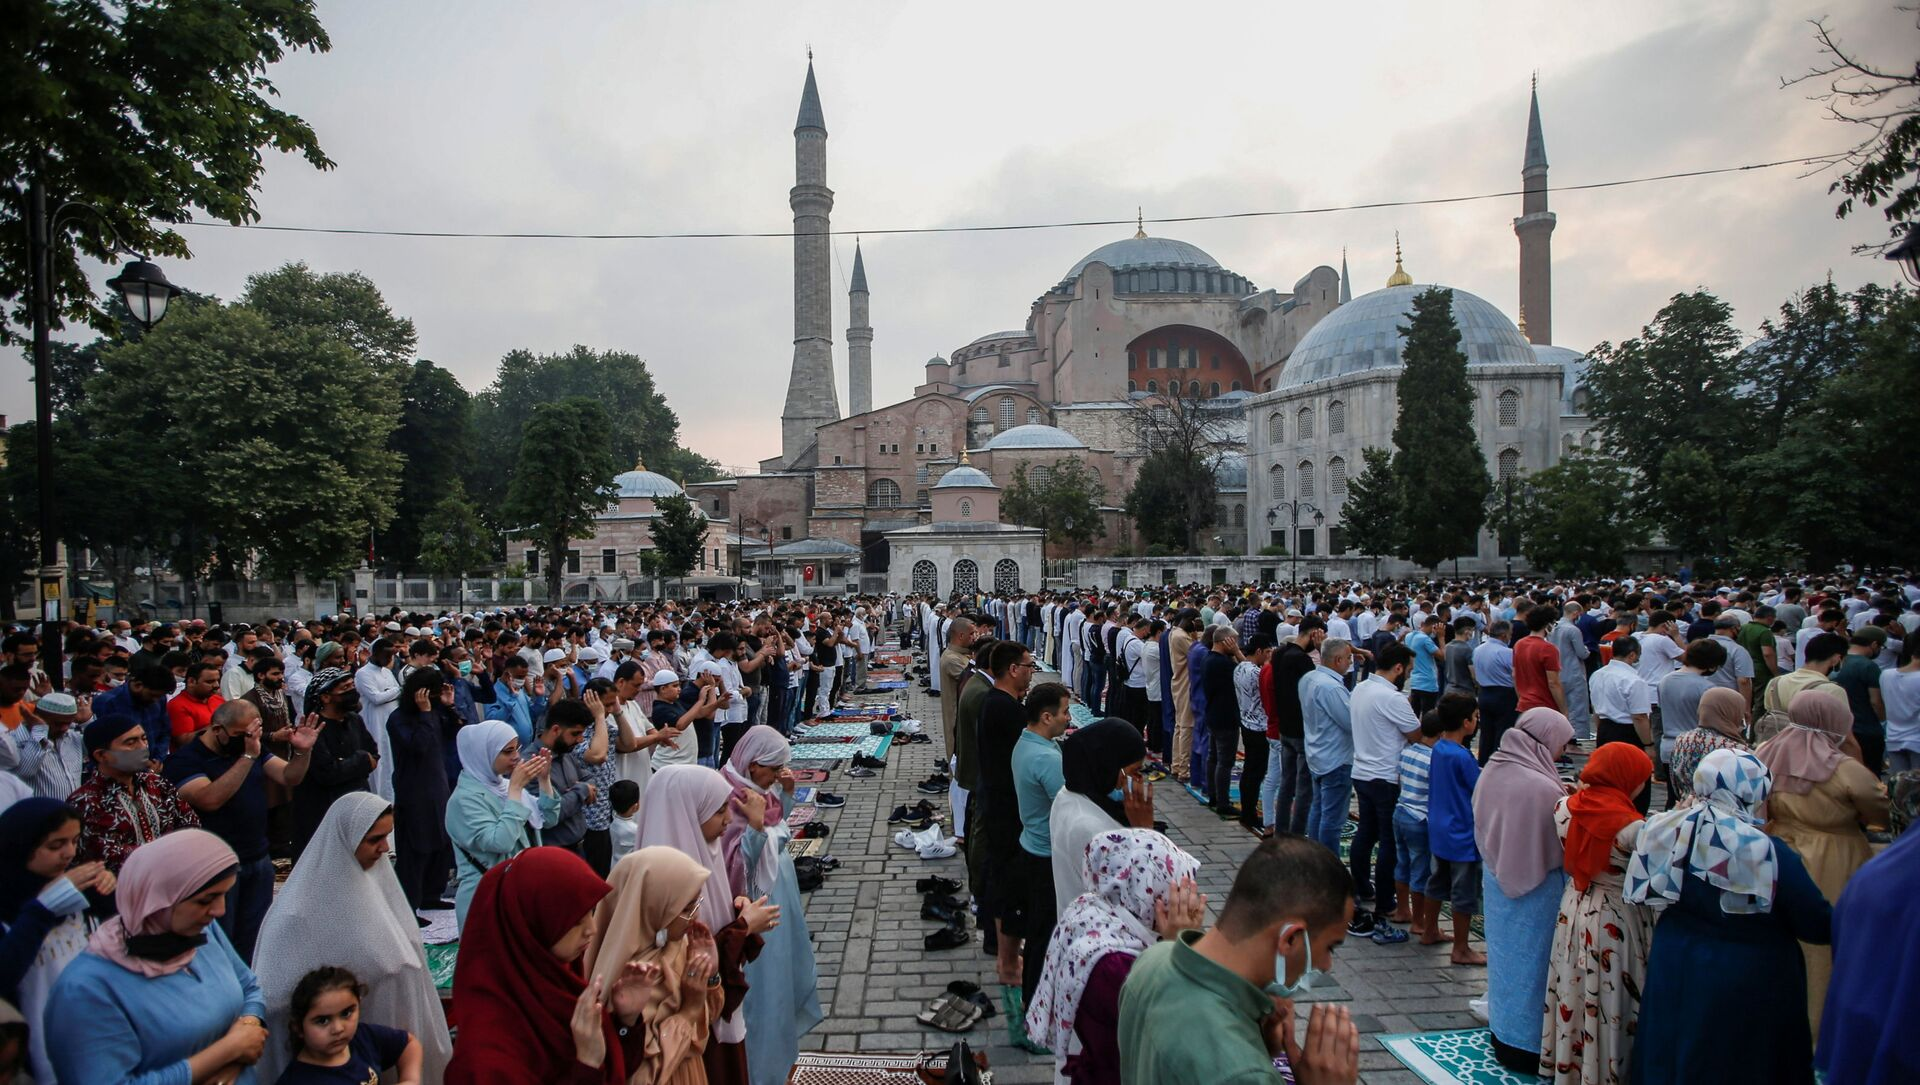 Worshippers attend prayers marking the Muslim festival of sacrifice Eid al-Adha at Hagia Sophia Grand Mosque in Istanbul, Turkey, July 20, 2021. - Sputnik International, 1920, 23.07.2021